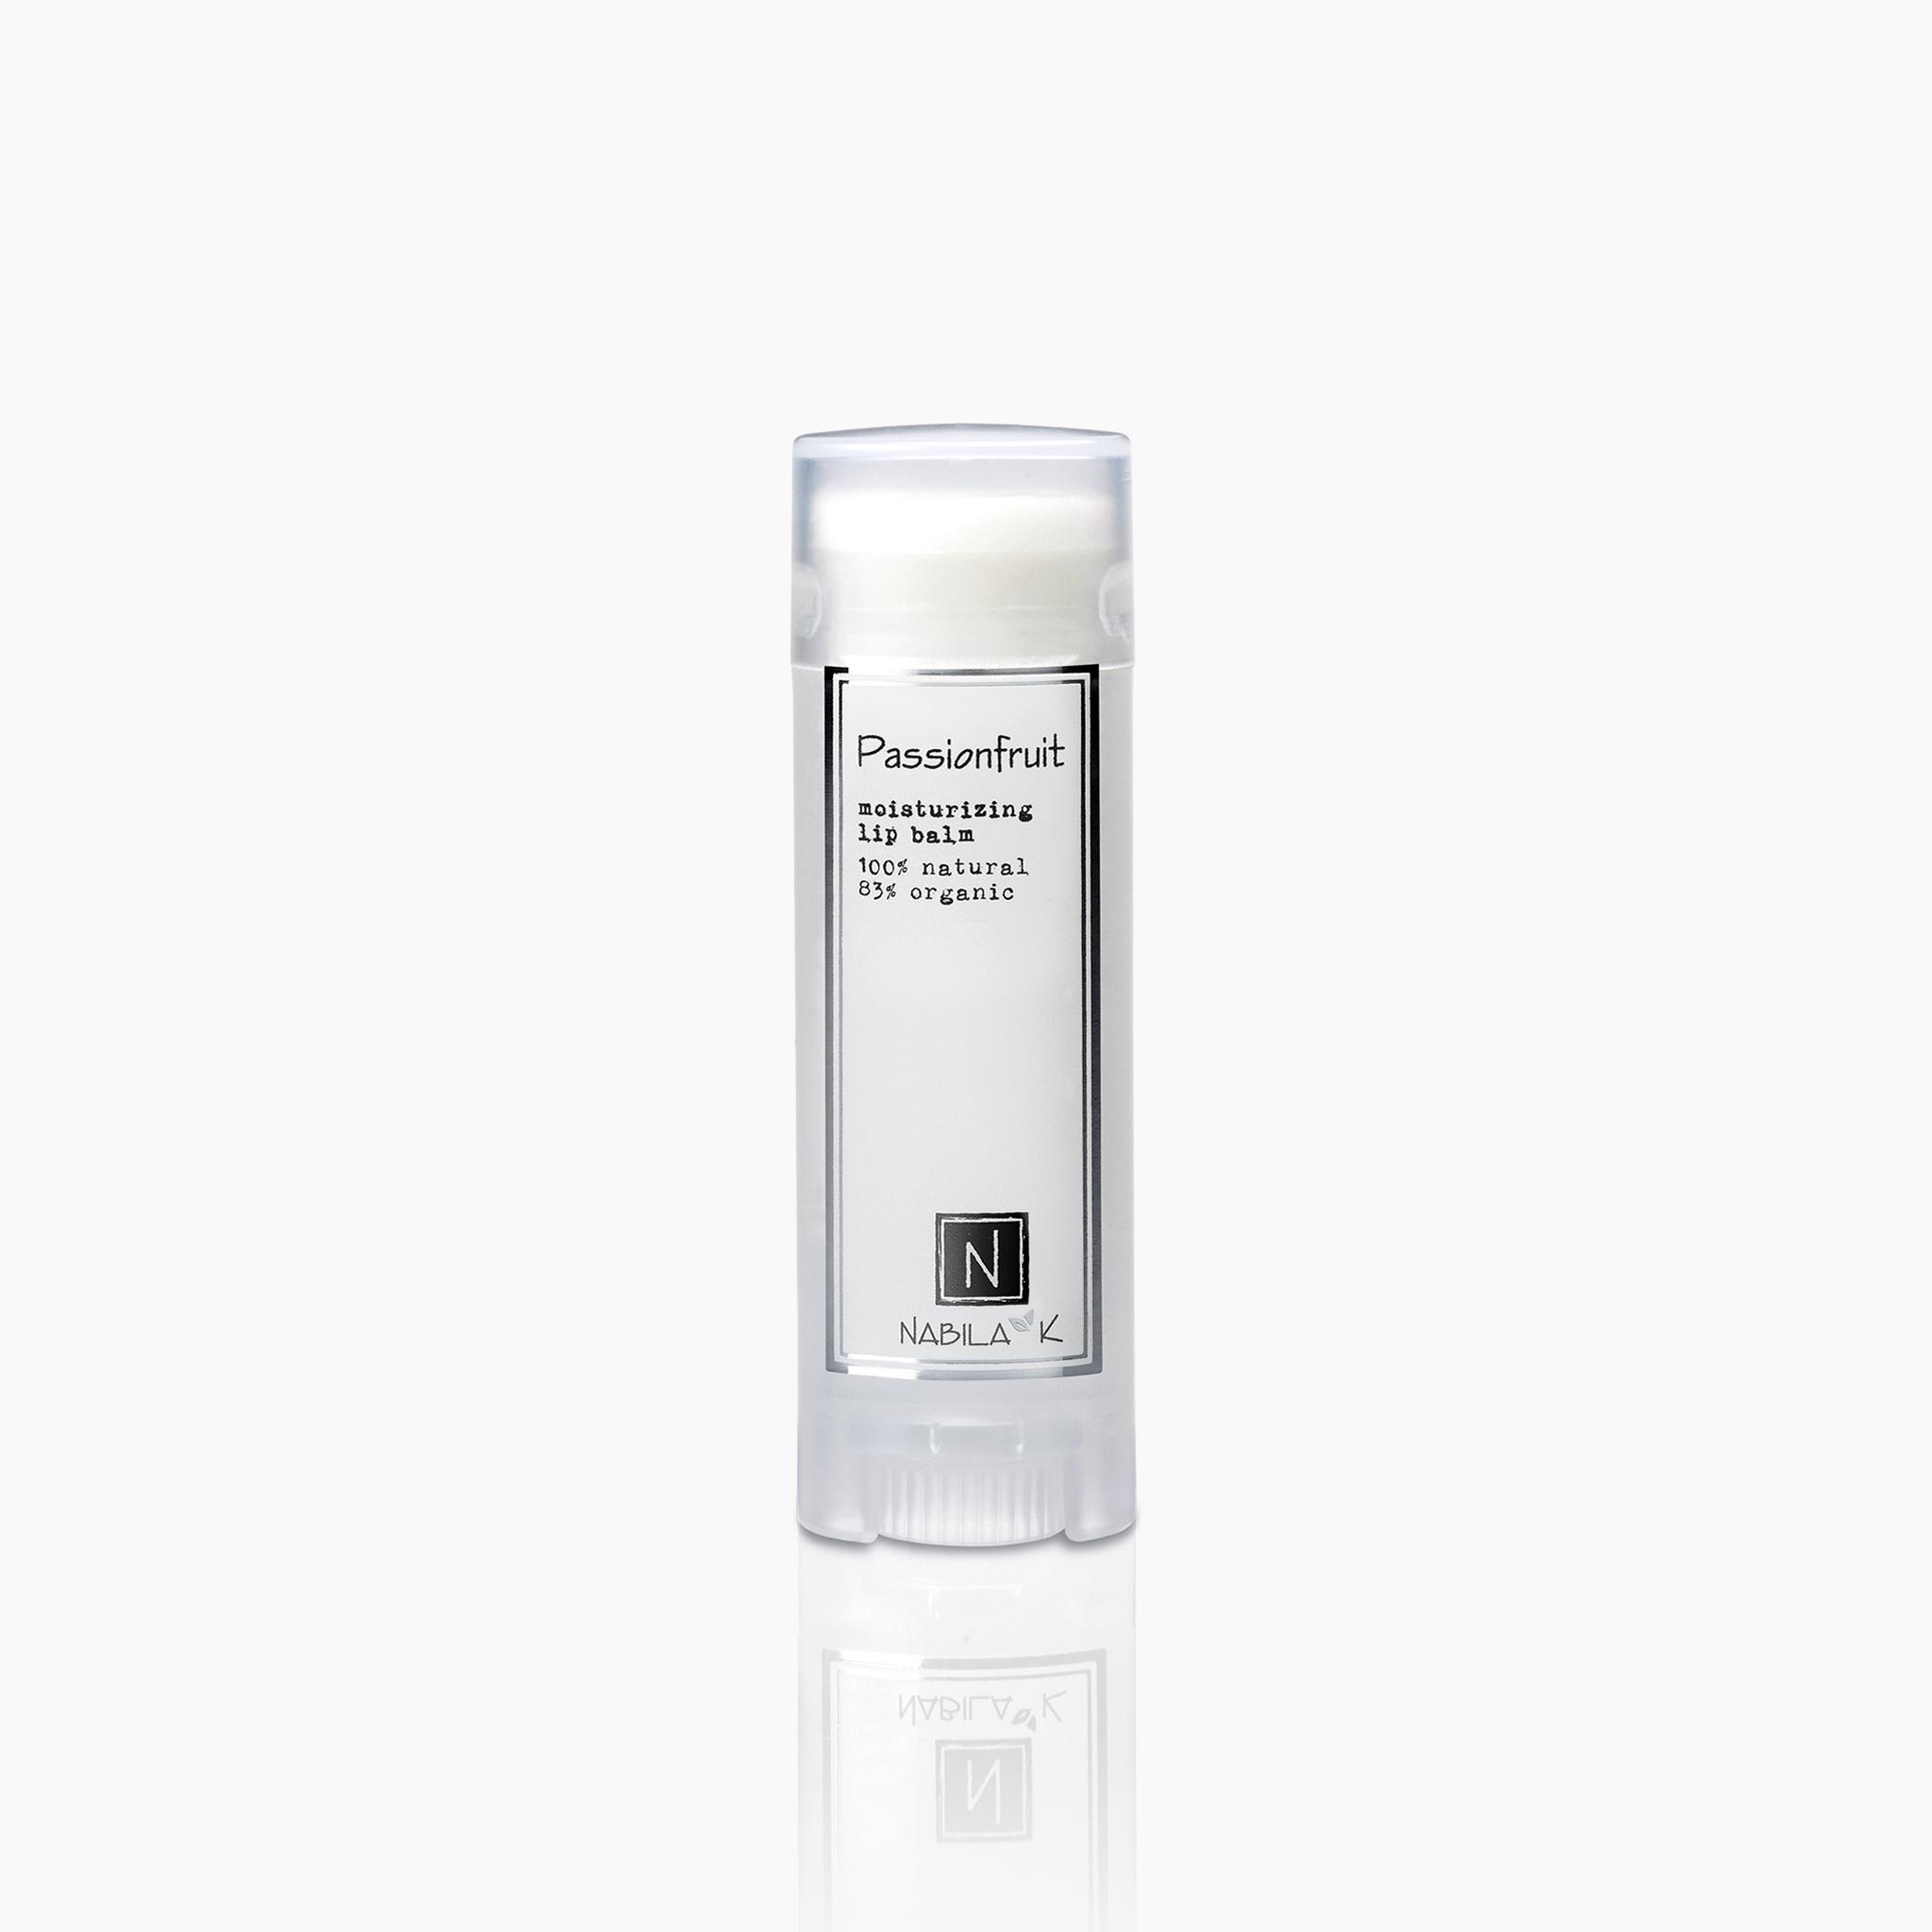 passion fruit moisturizing lip balm 100% natural 85% organic